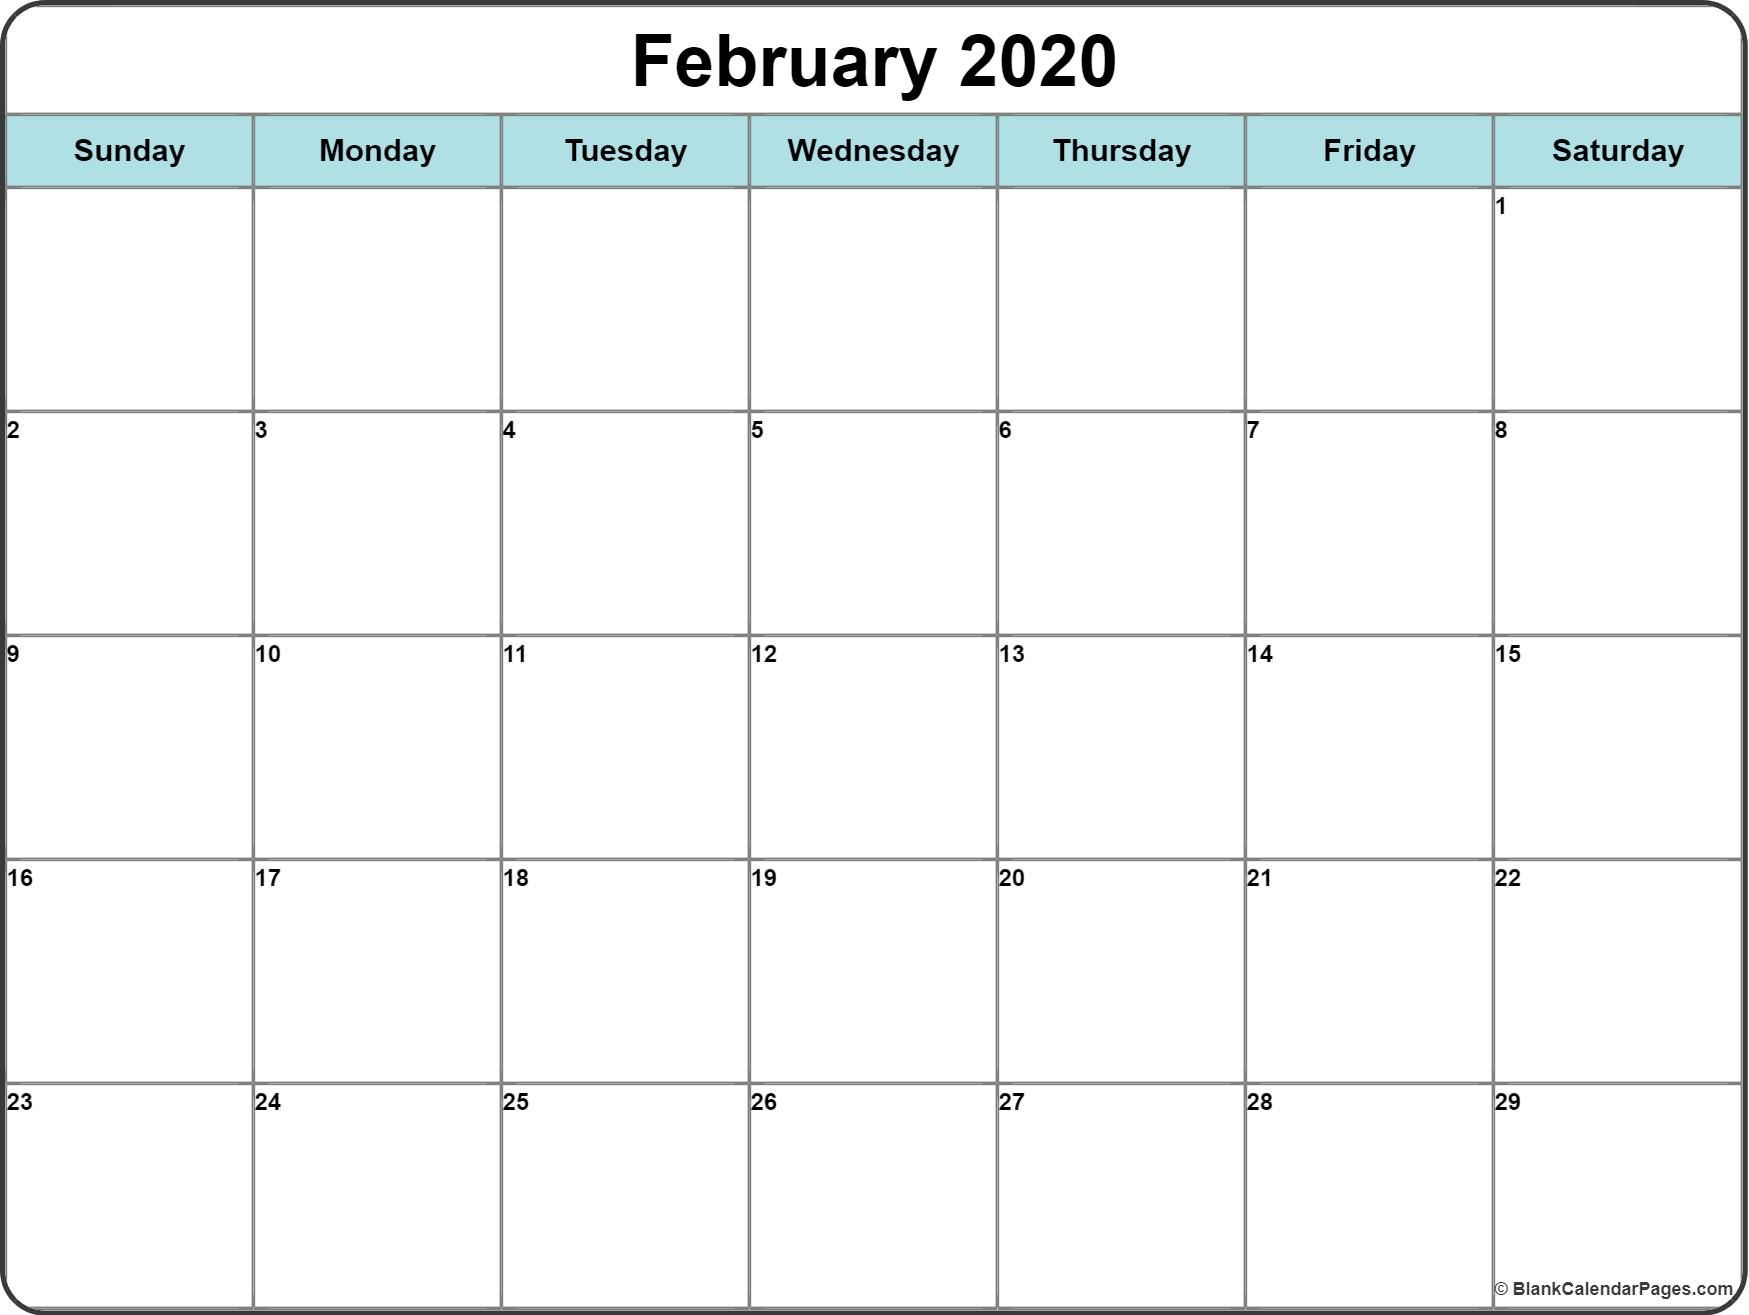 February 2020 Printable Calendar Template #2020Calendars